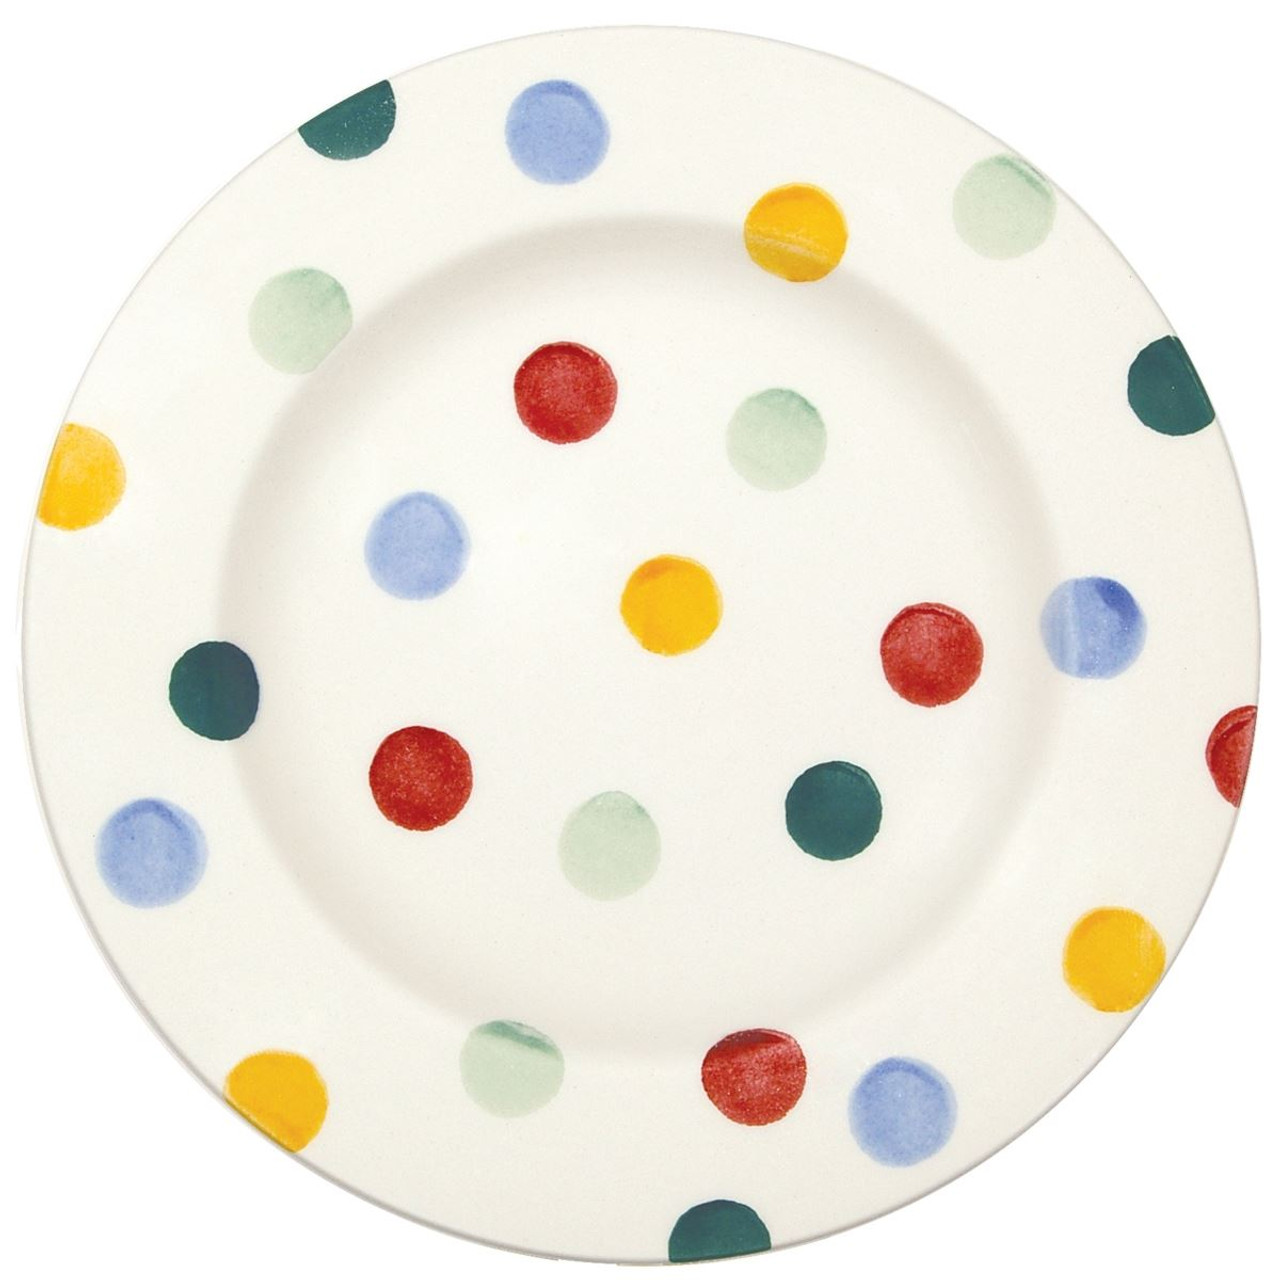 Emma Bridgewater Polka Dot 6.5 Inch Plate